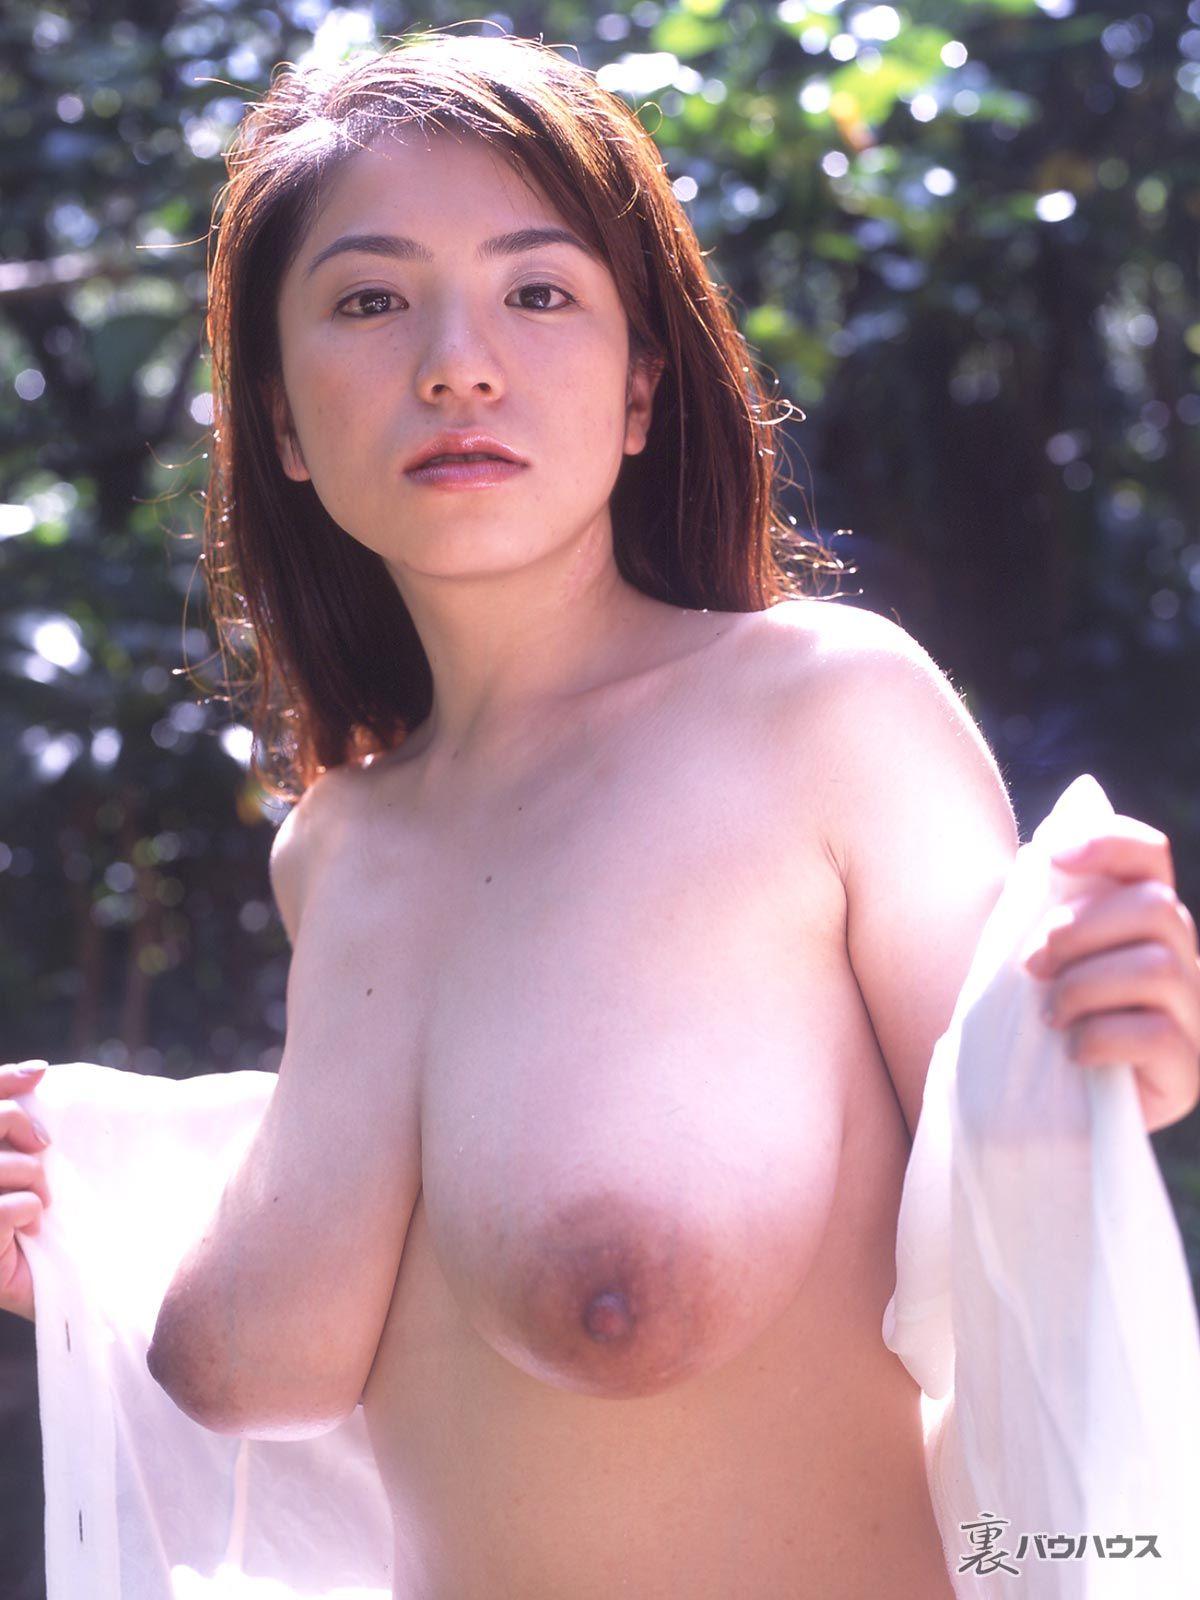 Hottest of petite nudes